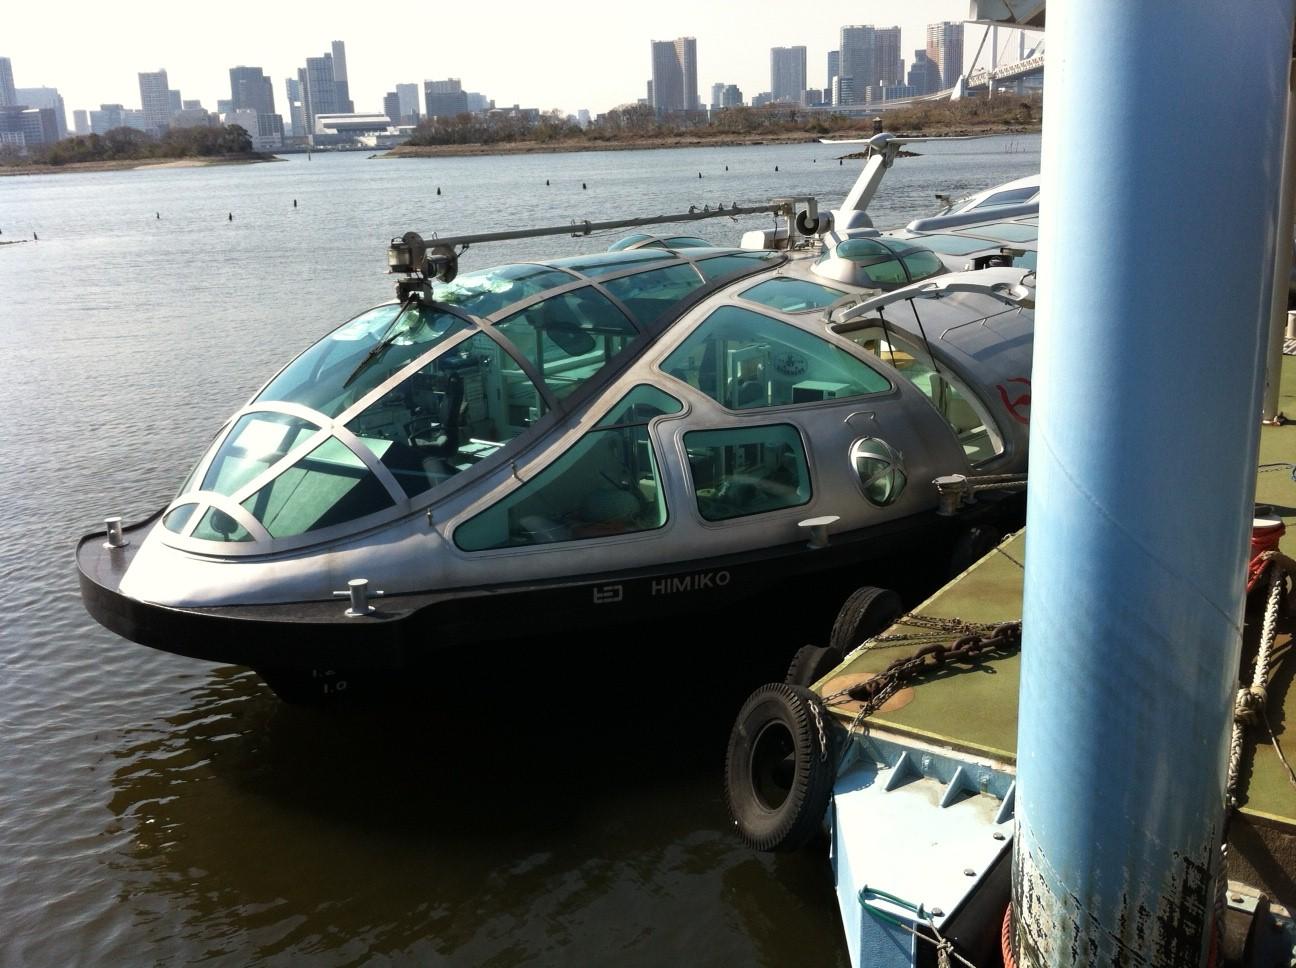 http://3.bp.blogspot.com/-FXzKhb-IPxE/T8VrWPOZbjI/AAAAAAAAARs/PTTBDHx7YEY/s1600/sumida+river+boat.JPG